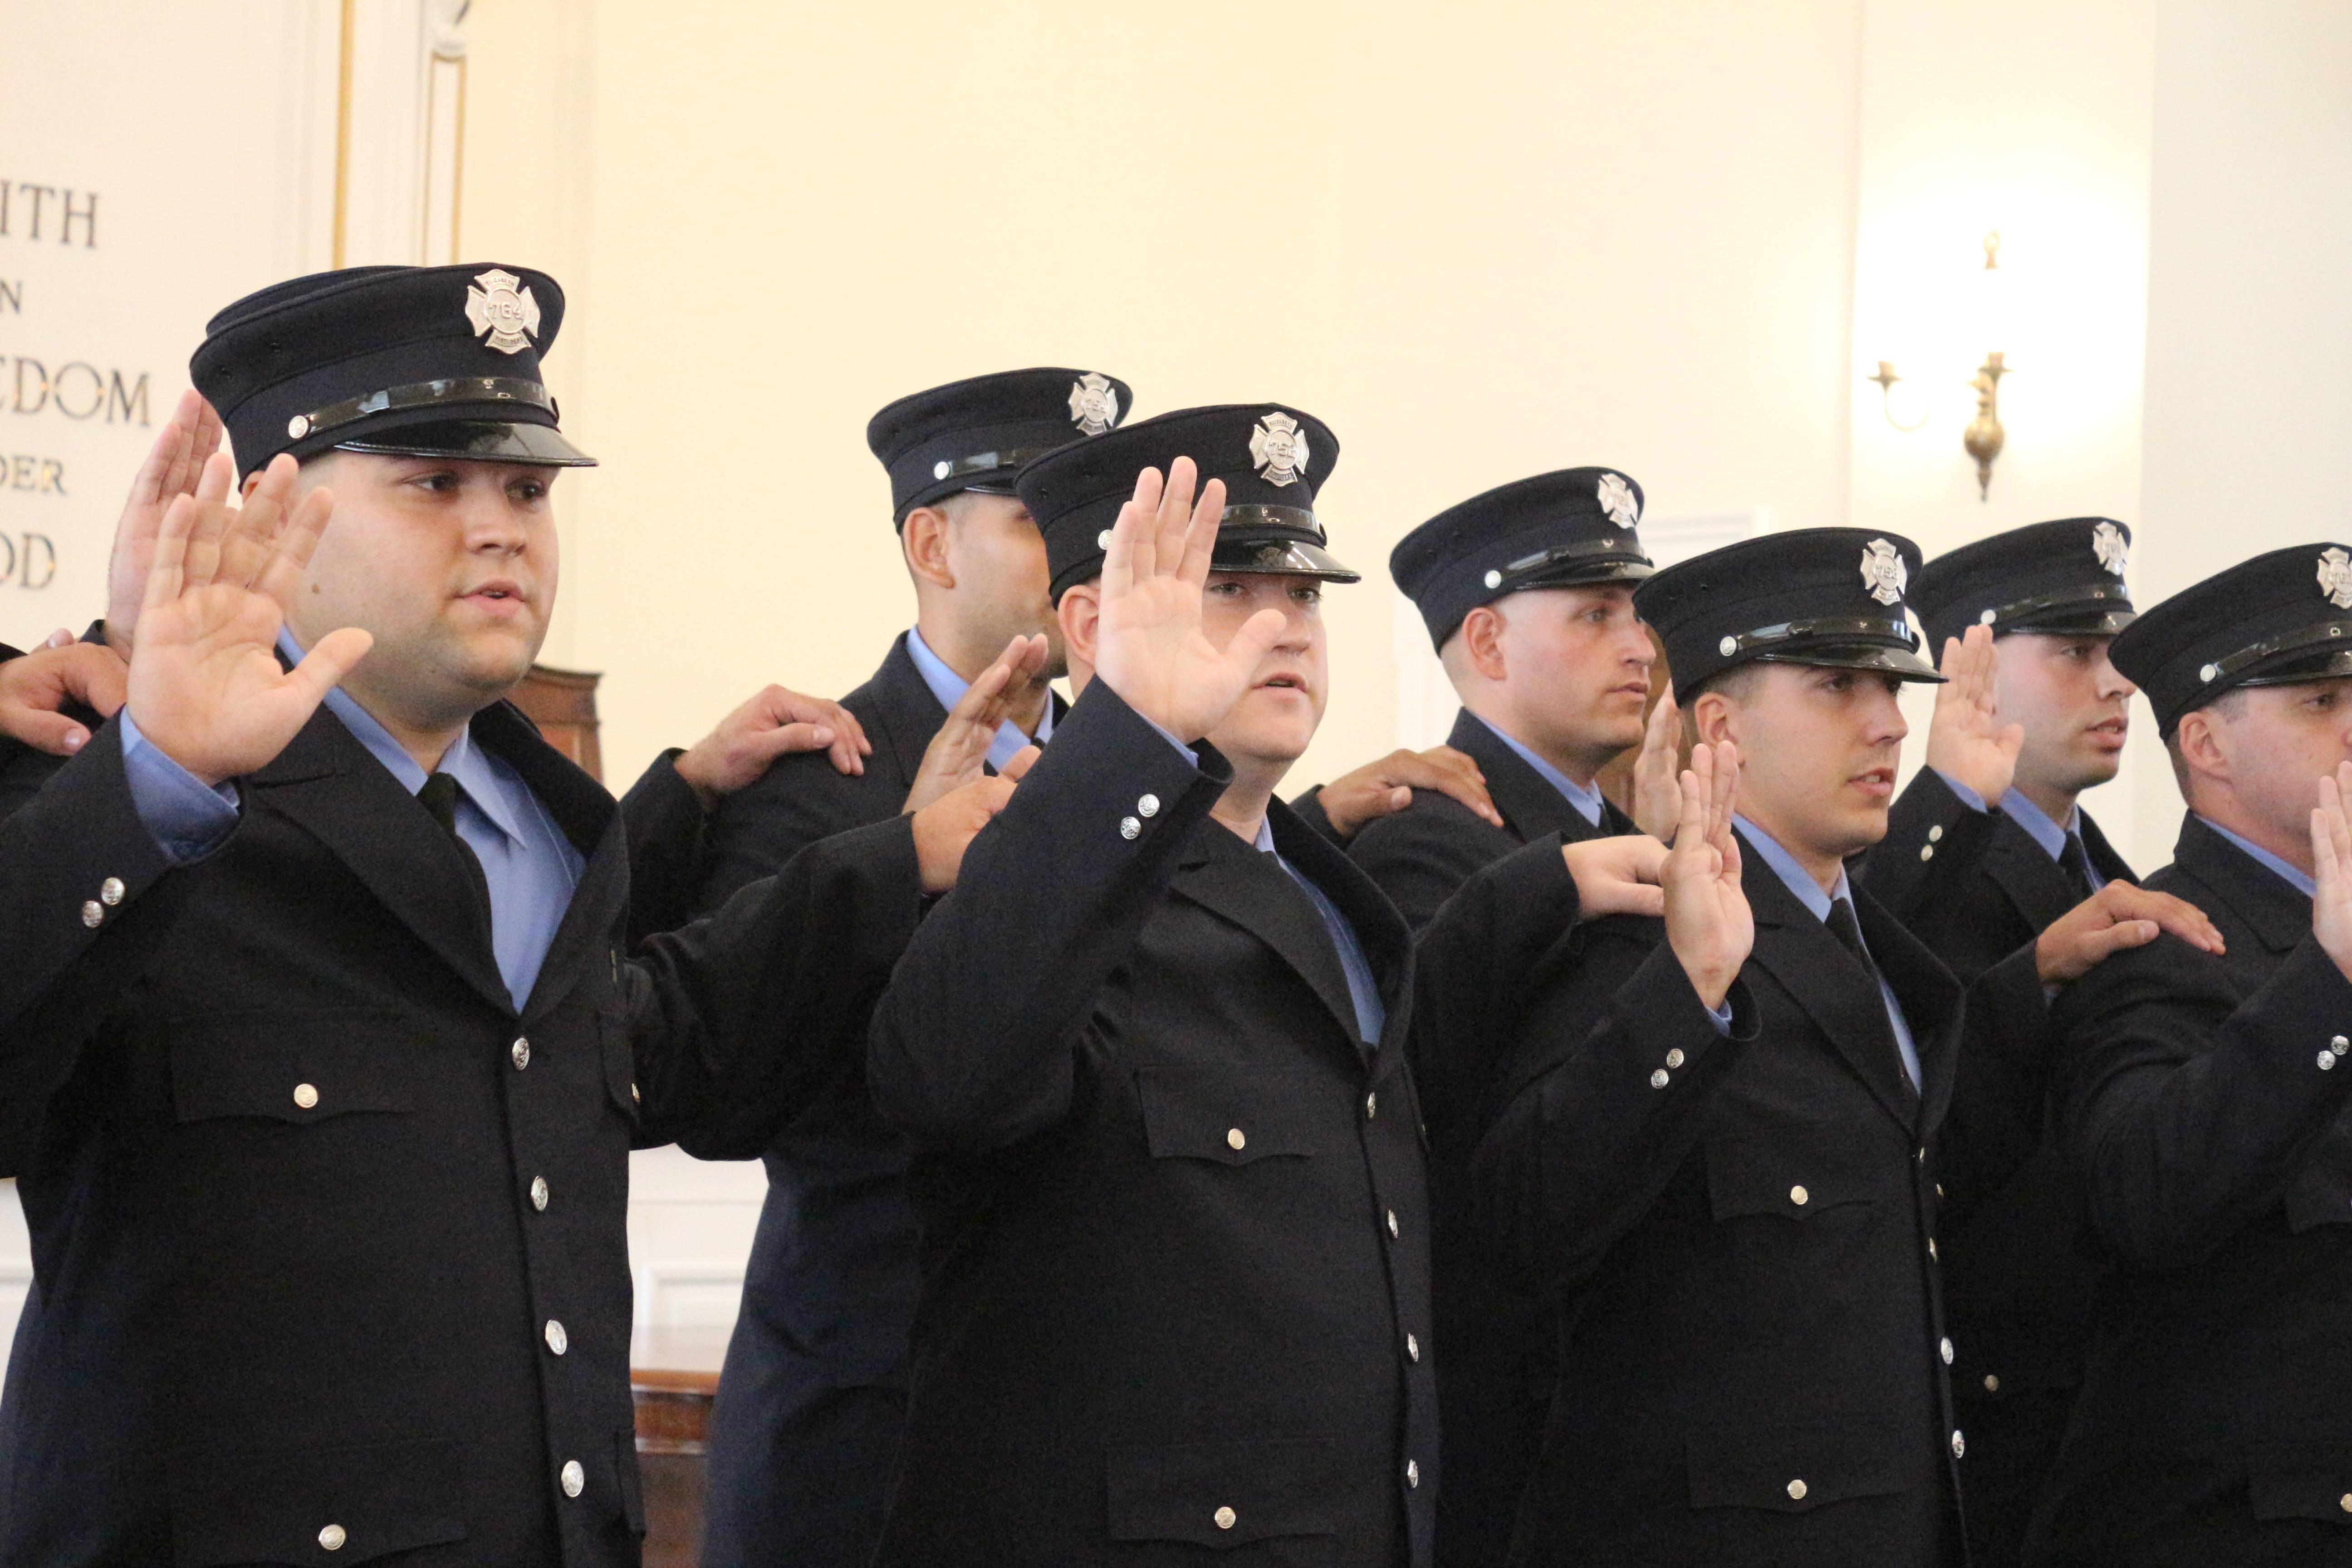 b734b3f3790422a176ad_elizabeth_fire_department_graduation_29.JPG